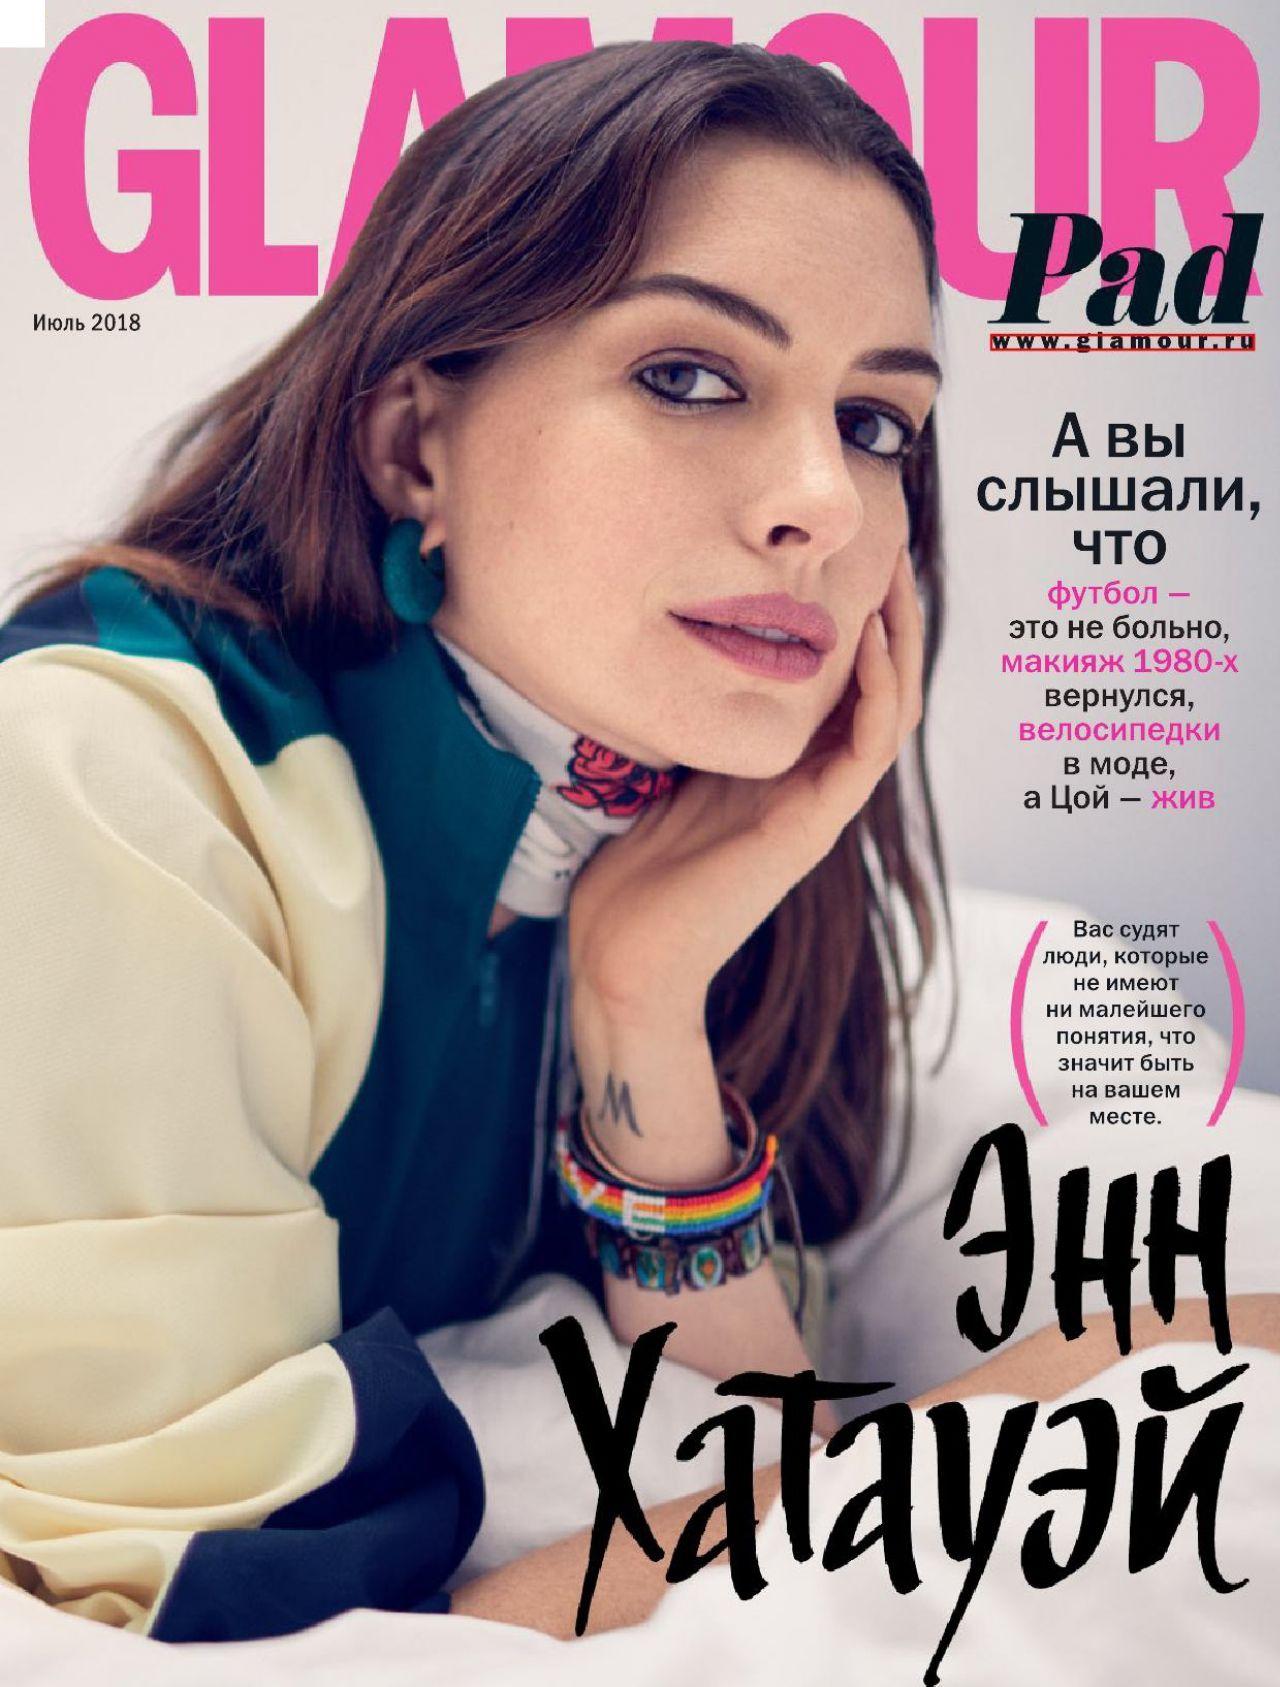 Anne Hathaway Latest Photos - CelebMafia